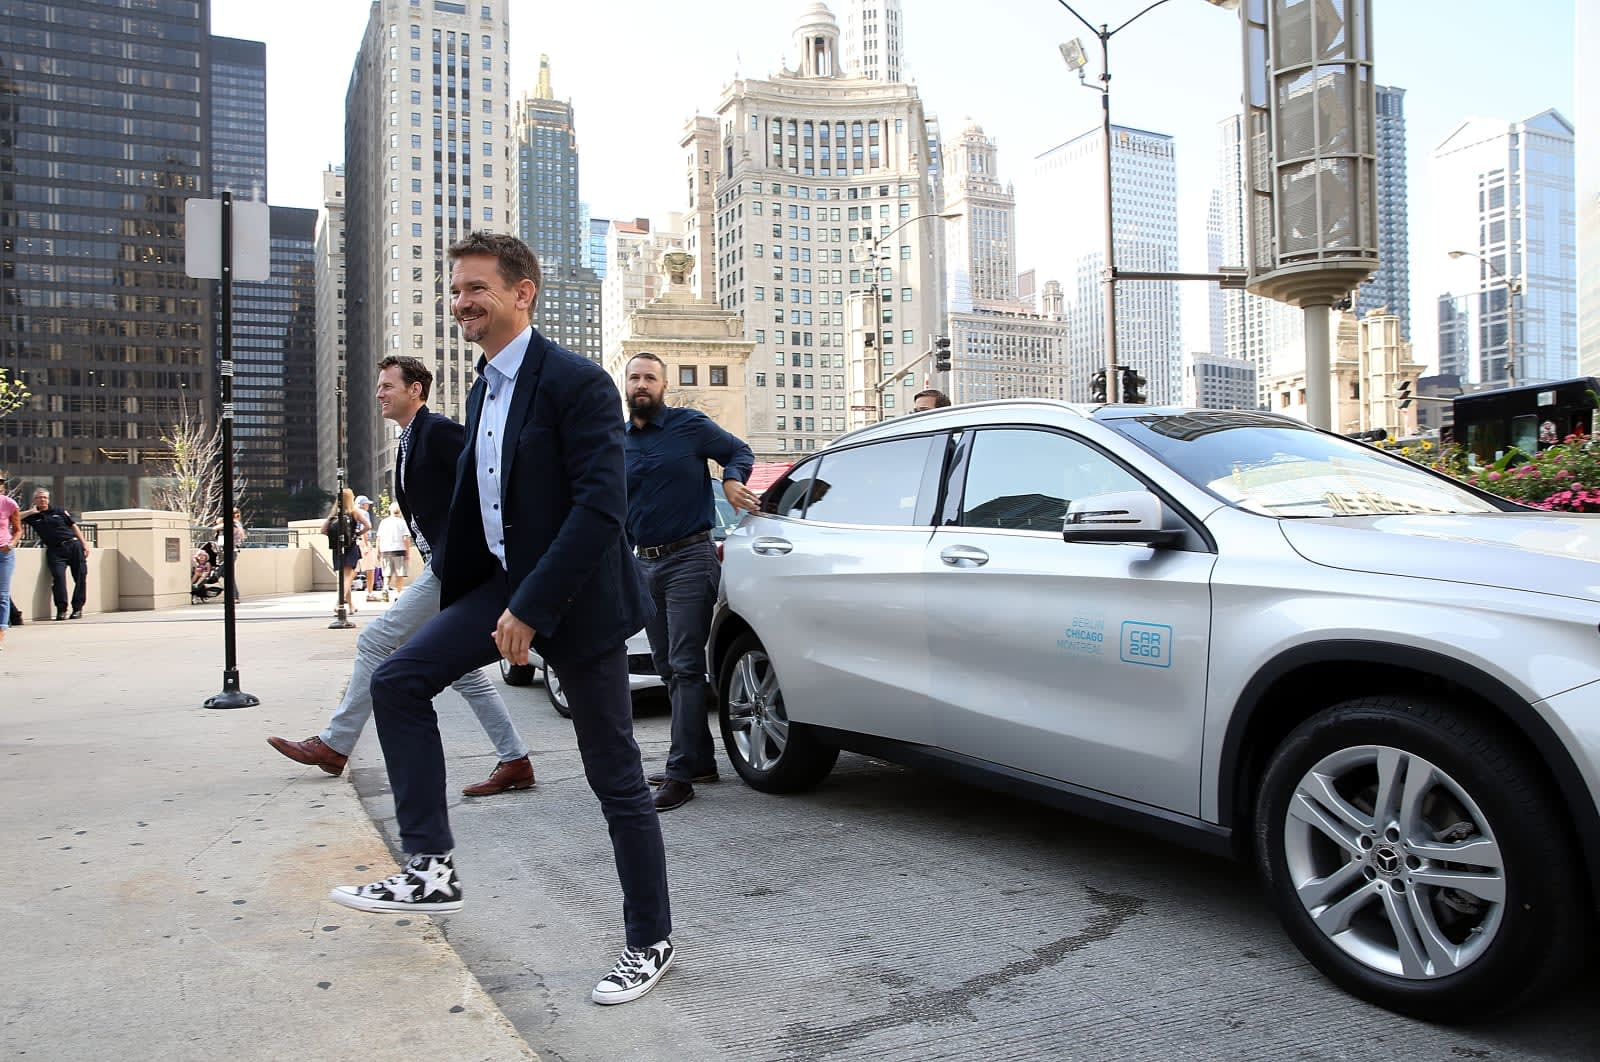 Car2go Fraud Caused Chicago Shutdown Not Hacking